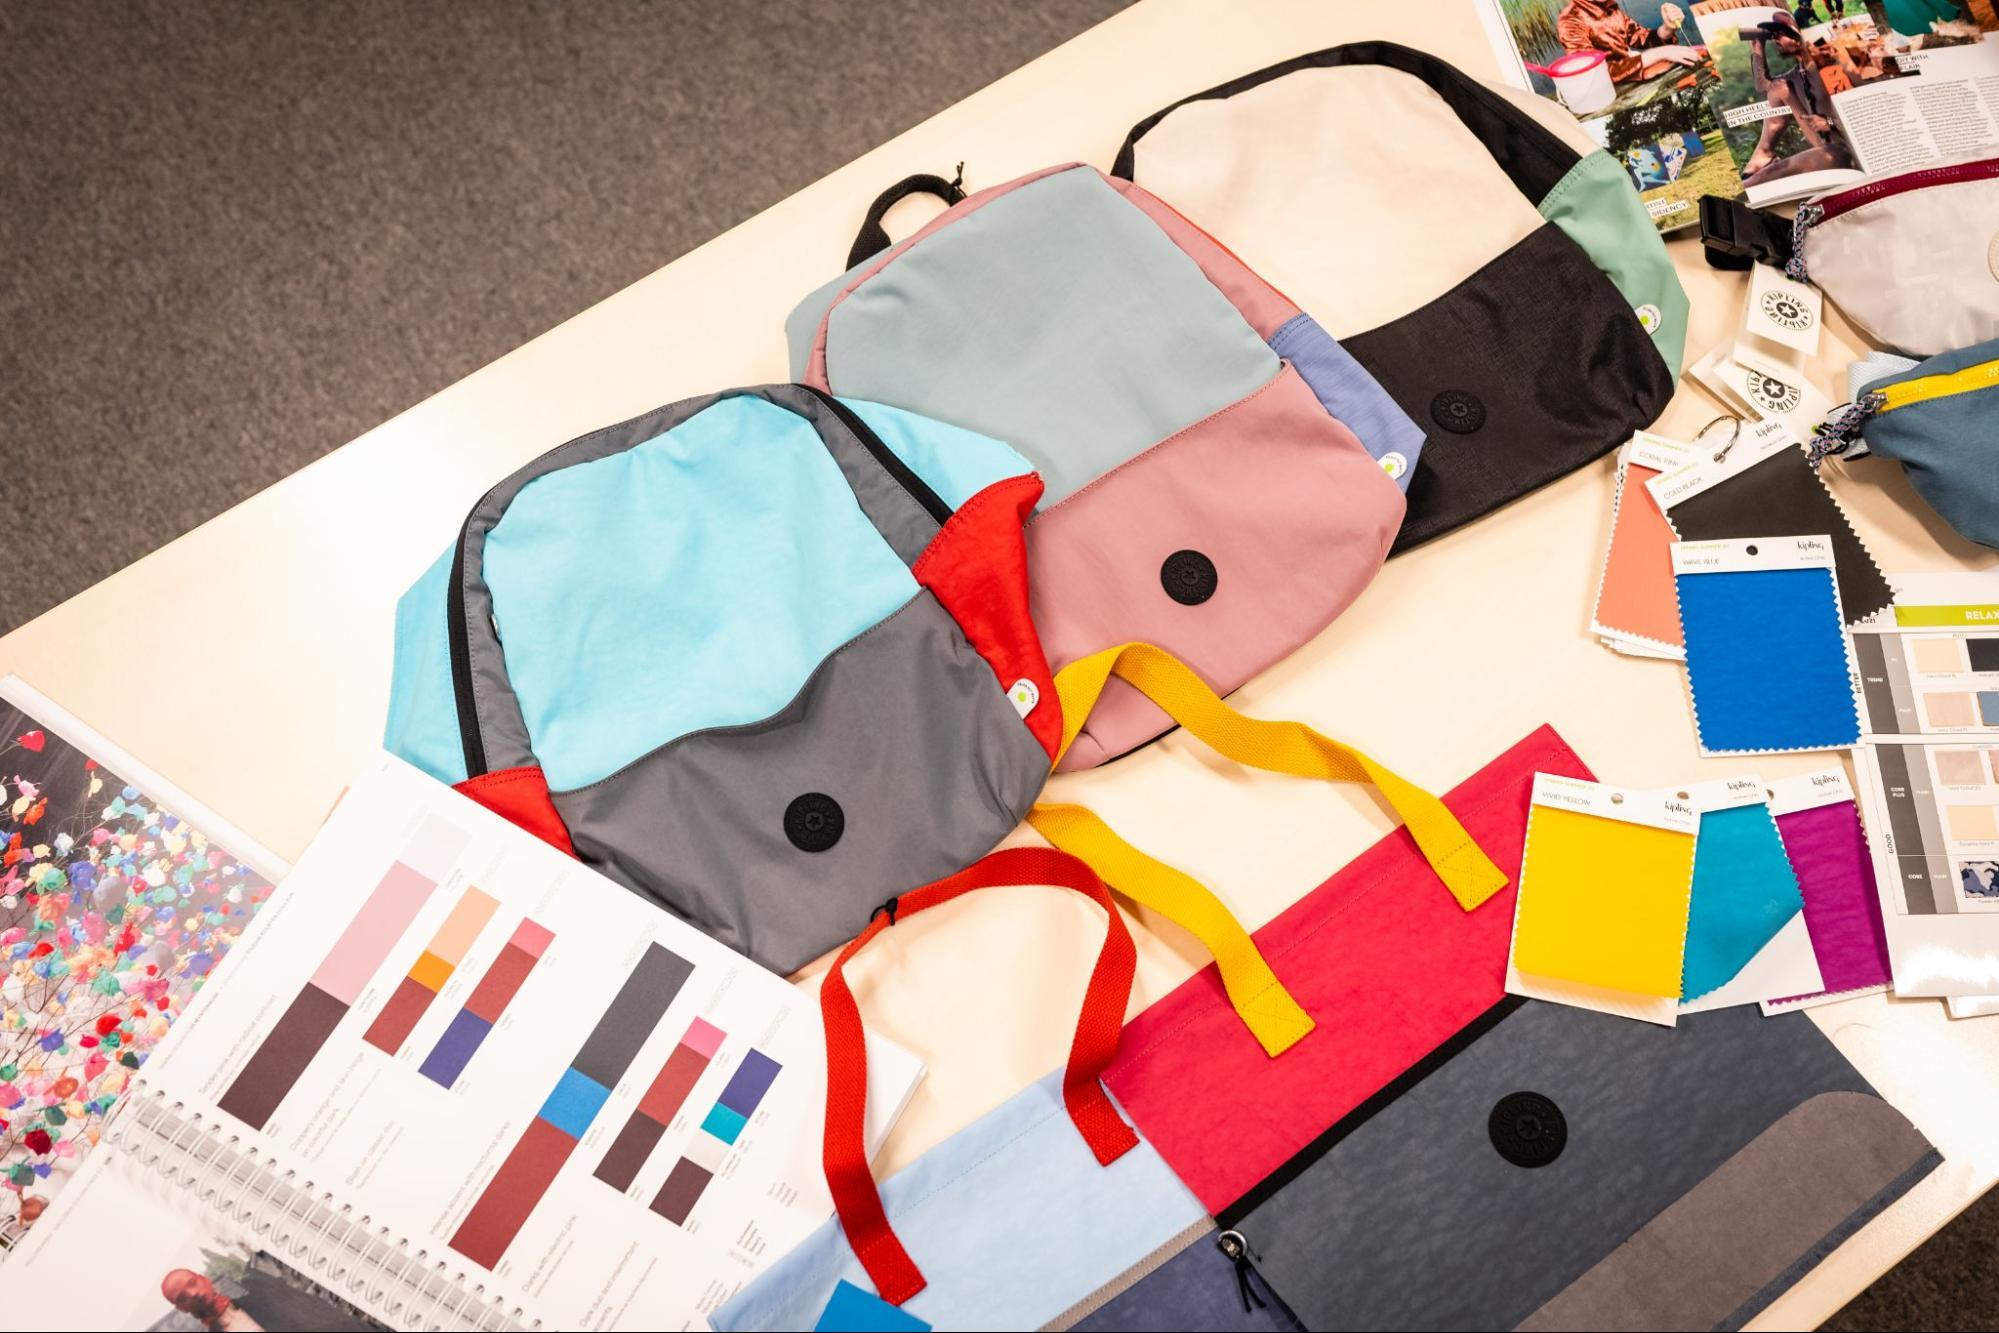 Kipling Bag Donation